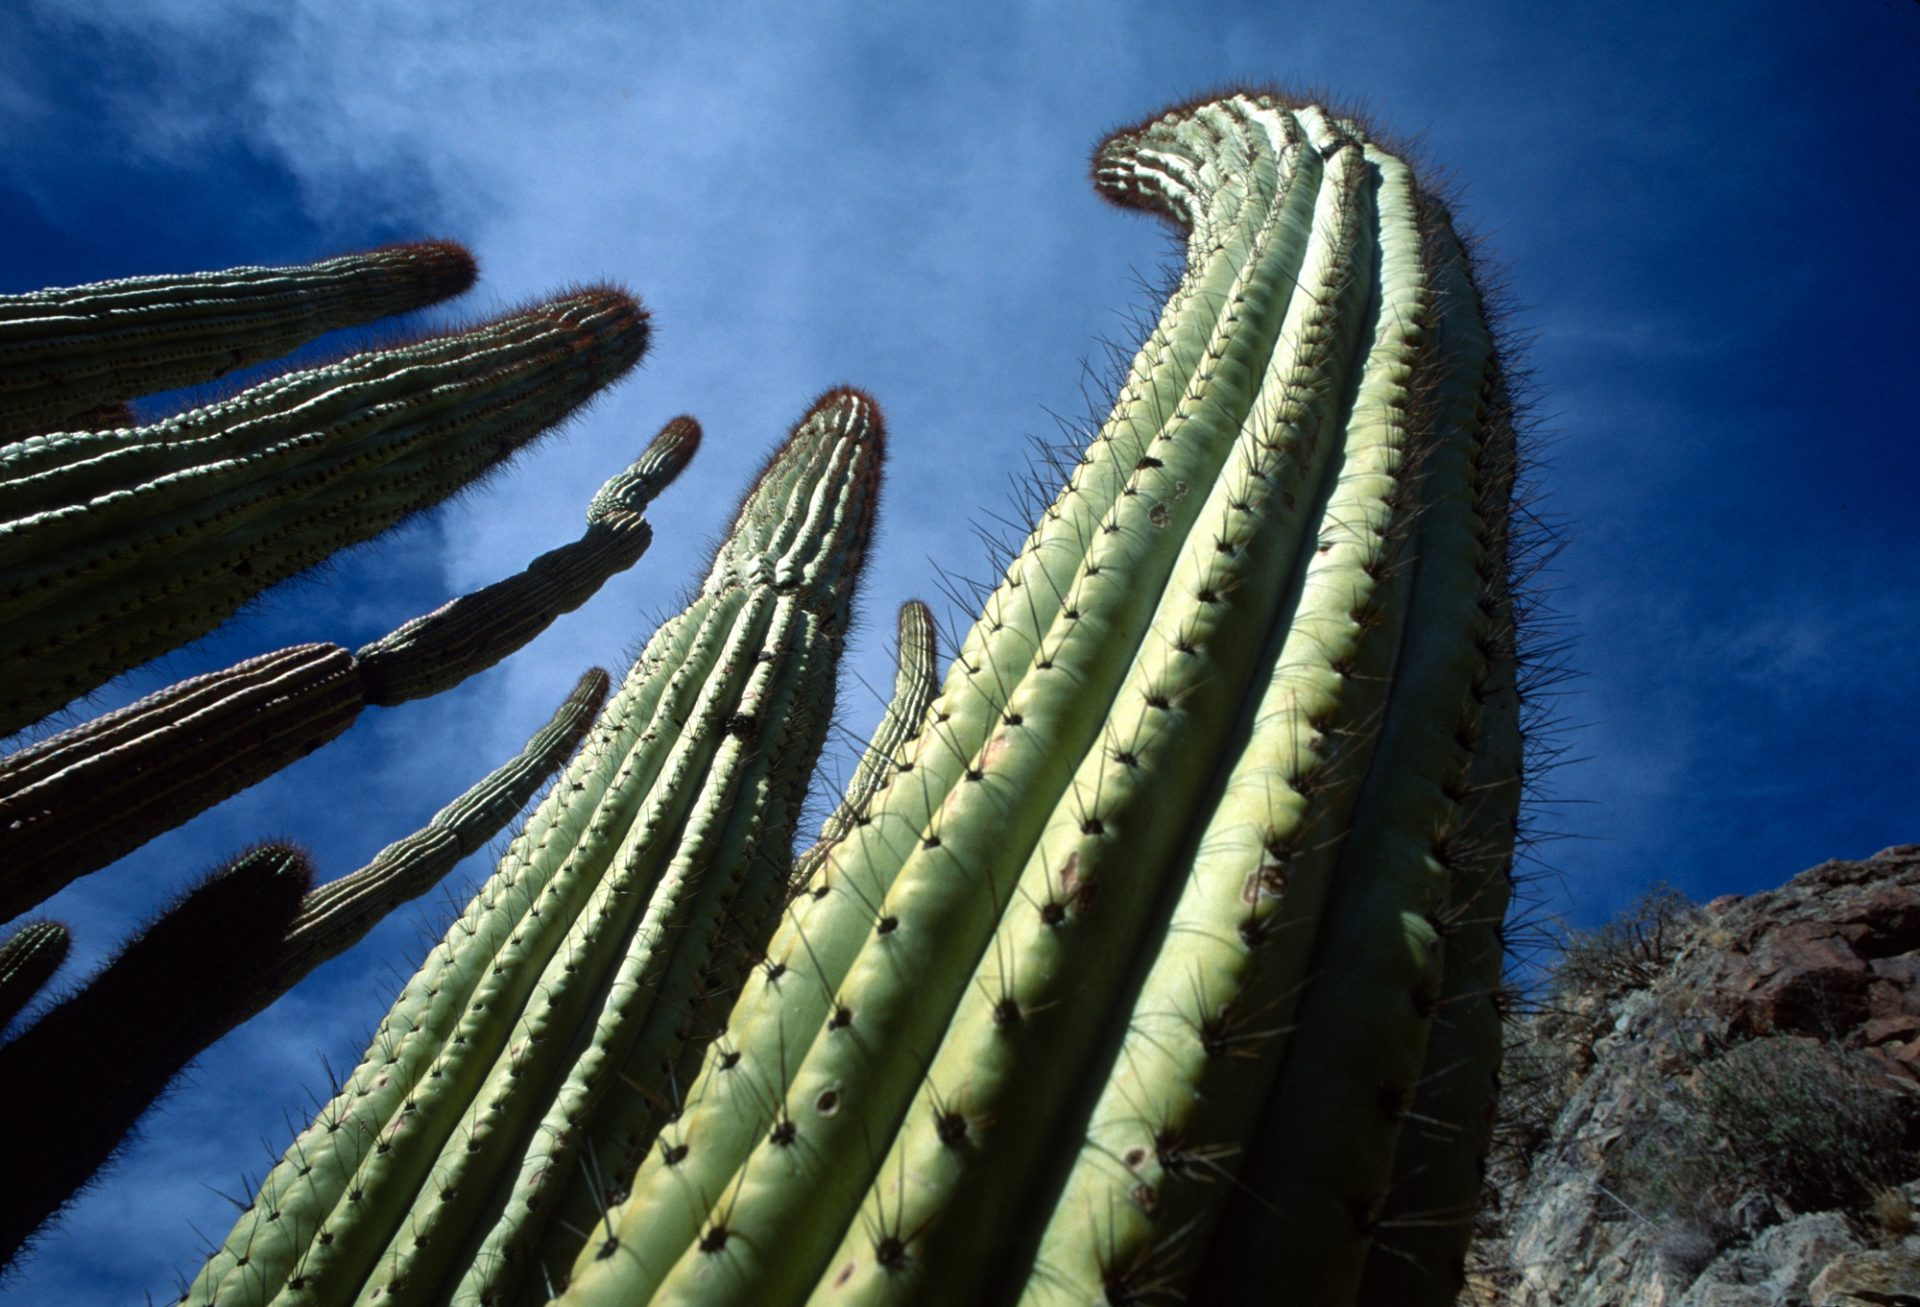 Photo: Cactus at Cabeza Prieta National Wildlife Refuges, Arizona.